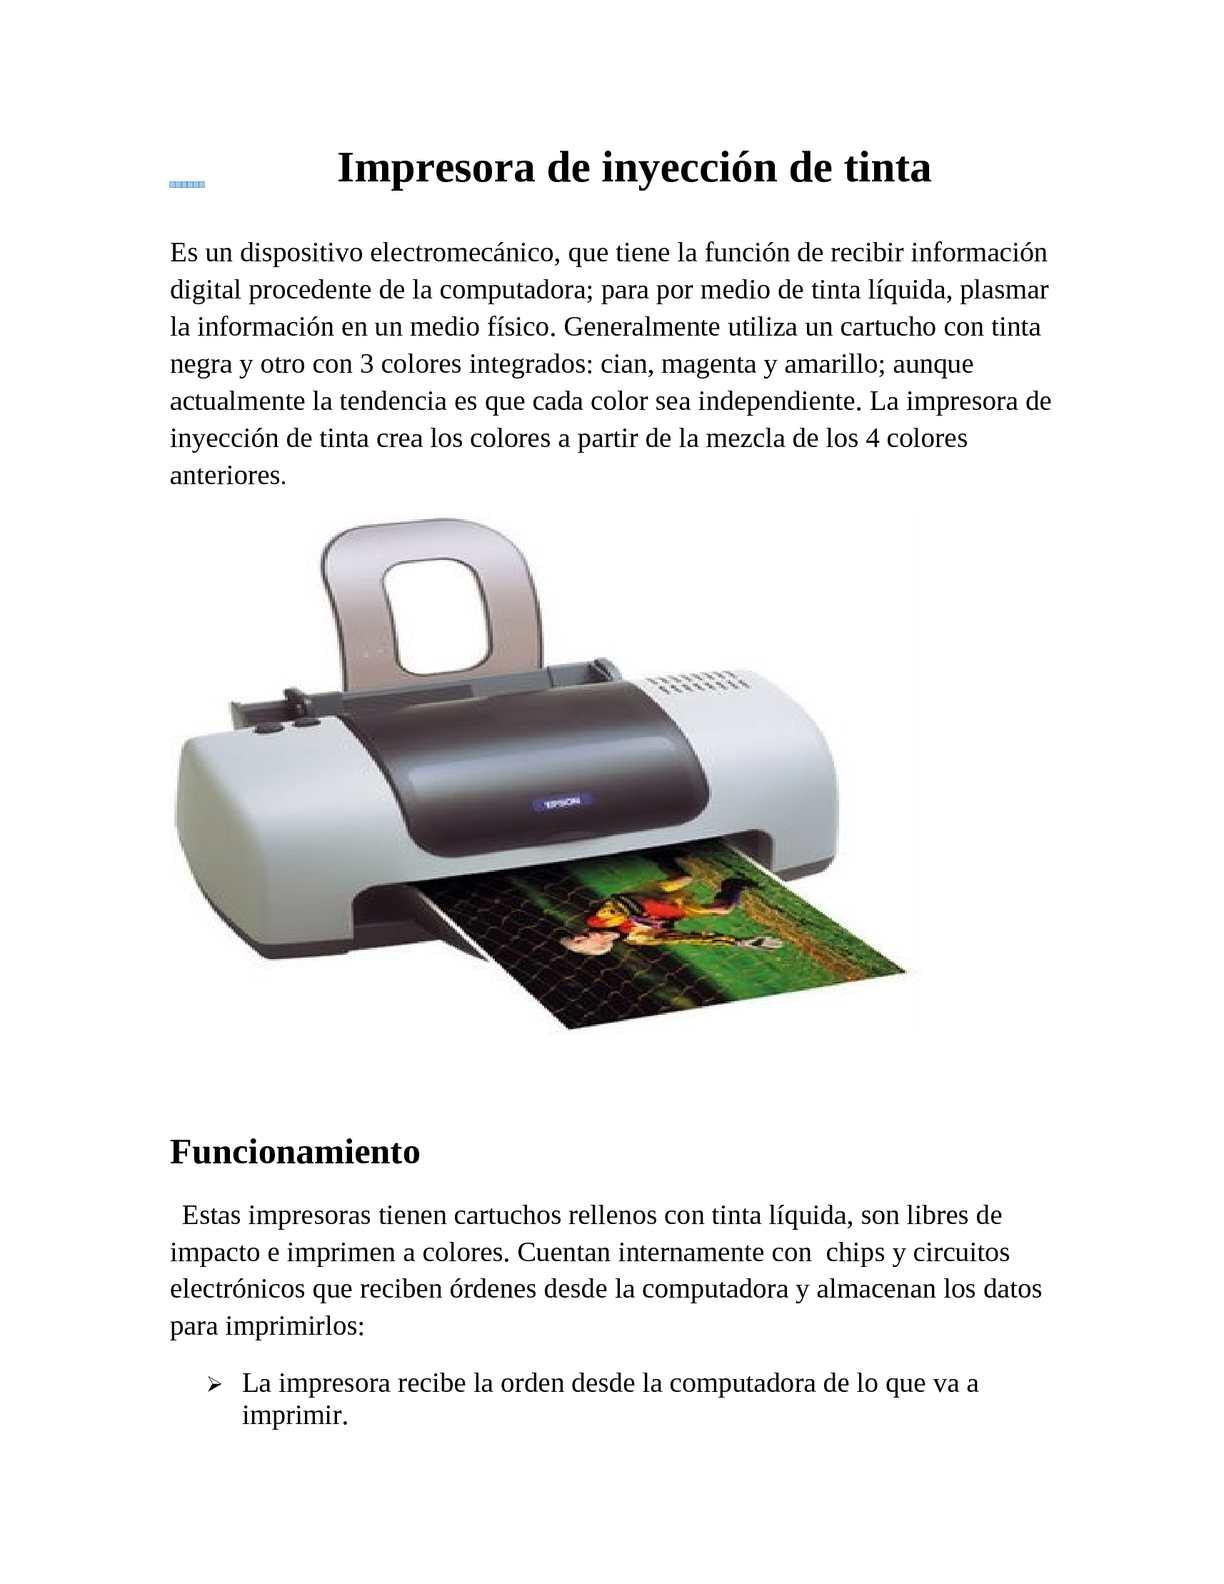 Calaméo - Impresora de inyección de tinta